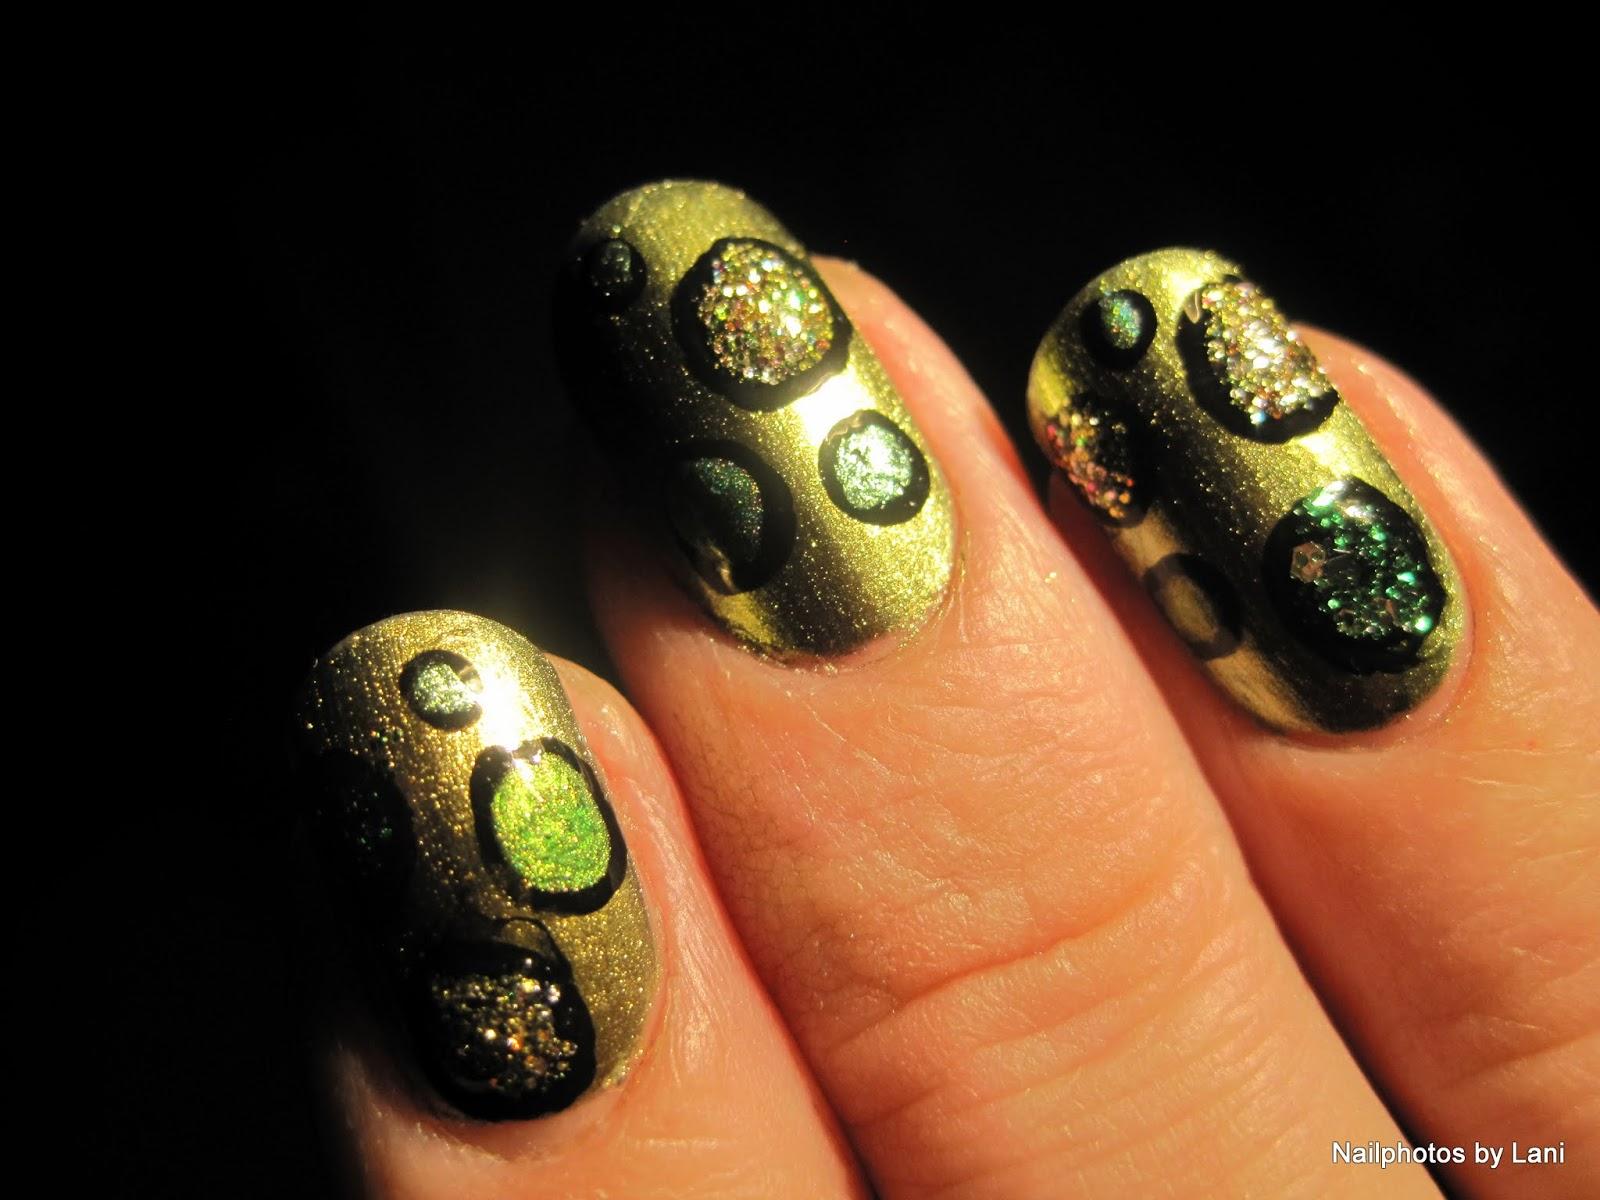 Nailphotos by Lani: Green Depression Awareness Nail Art